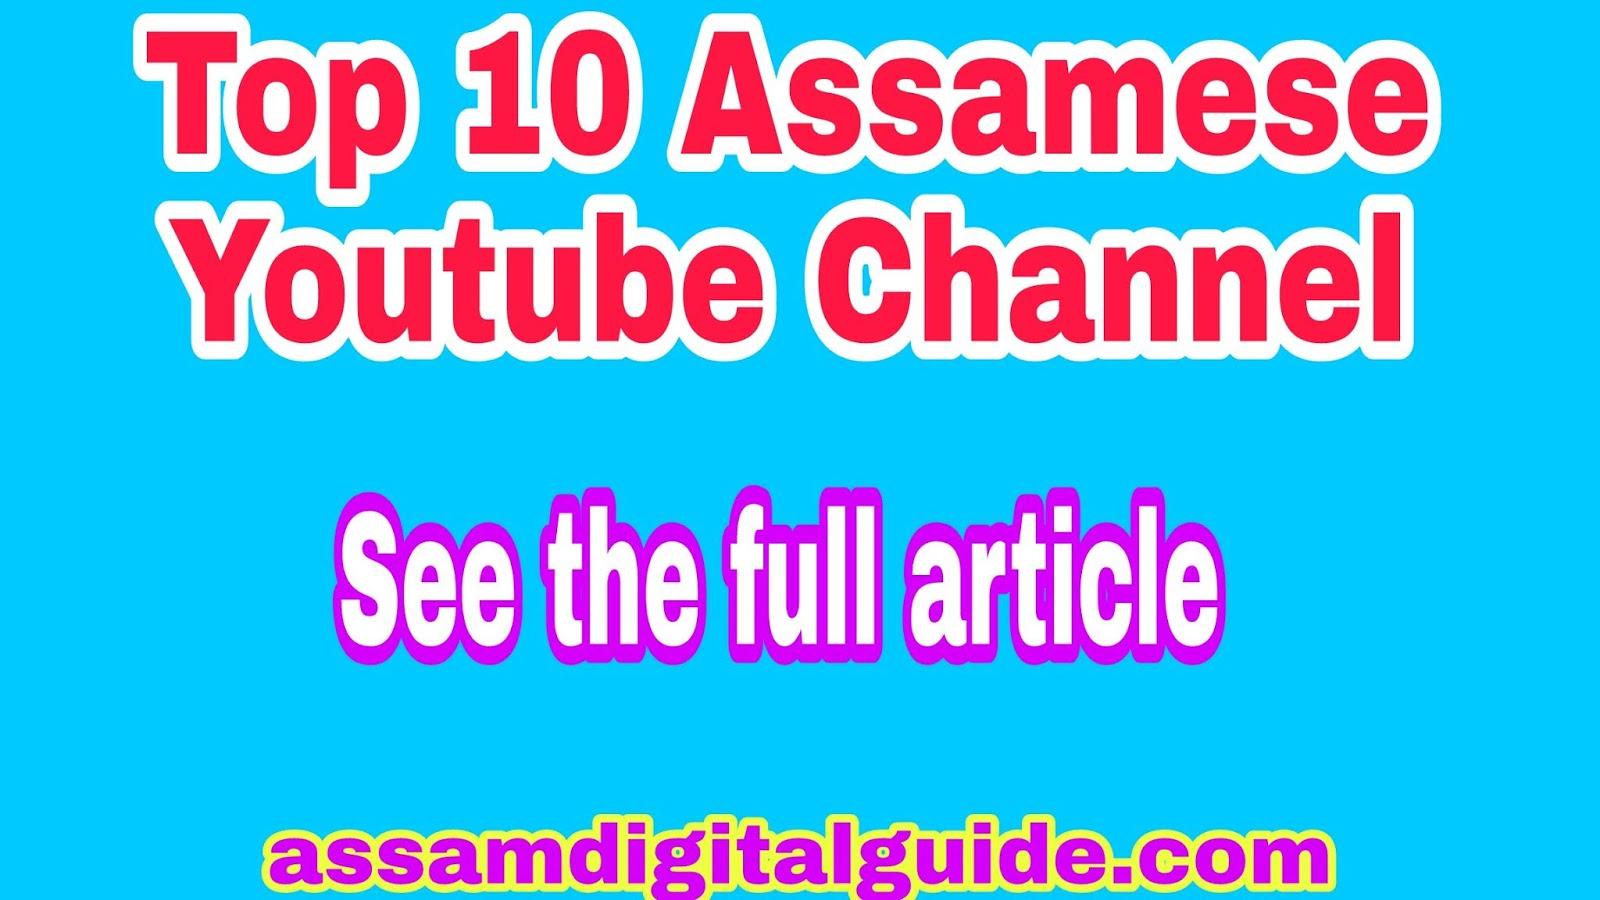 Top 10 Assamese Youtube Channel Dimpu Baruah Voice Assam Assamese Mixture Sunny Golden and many more